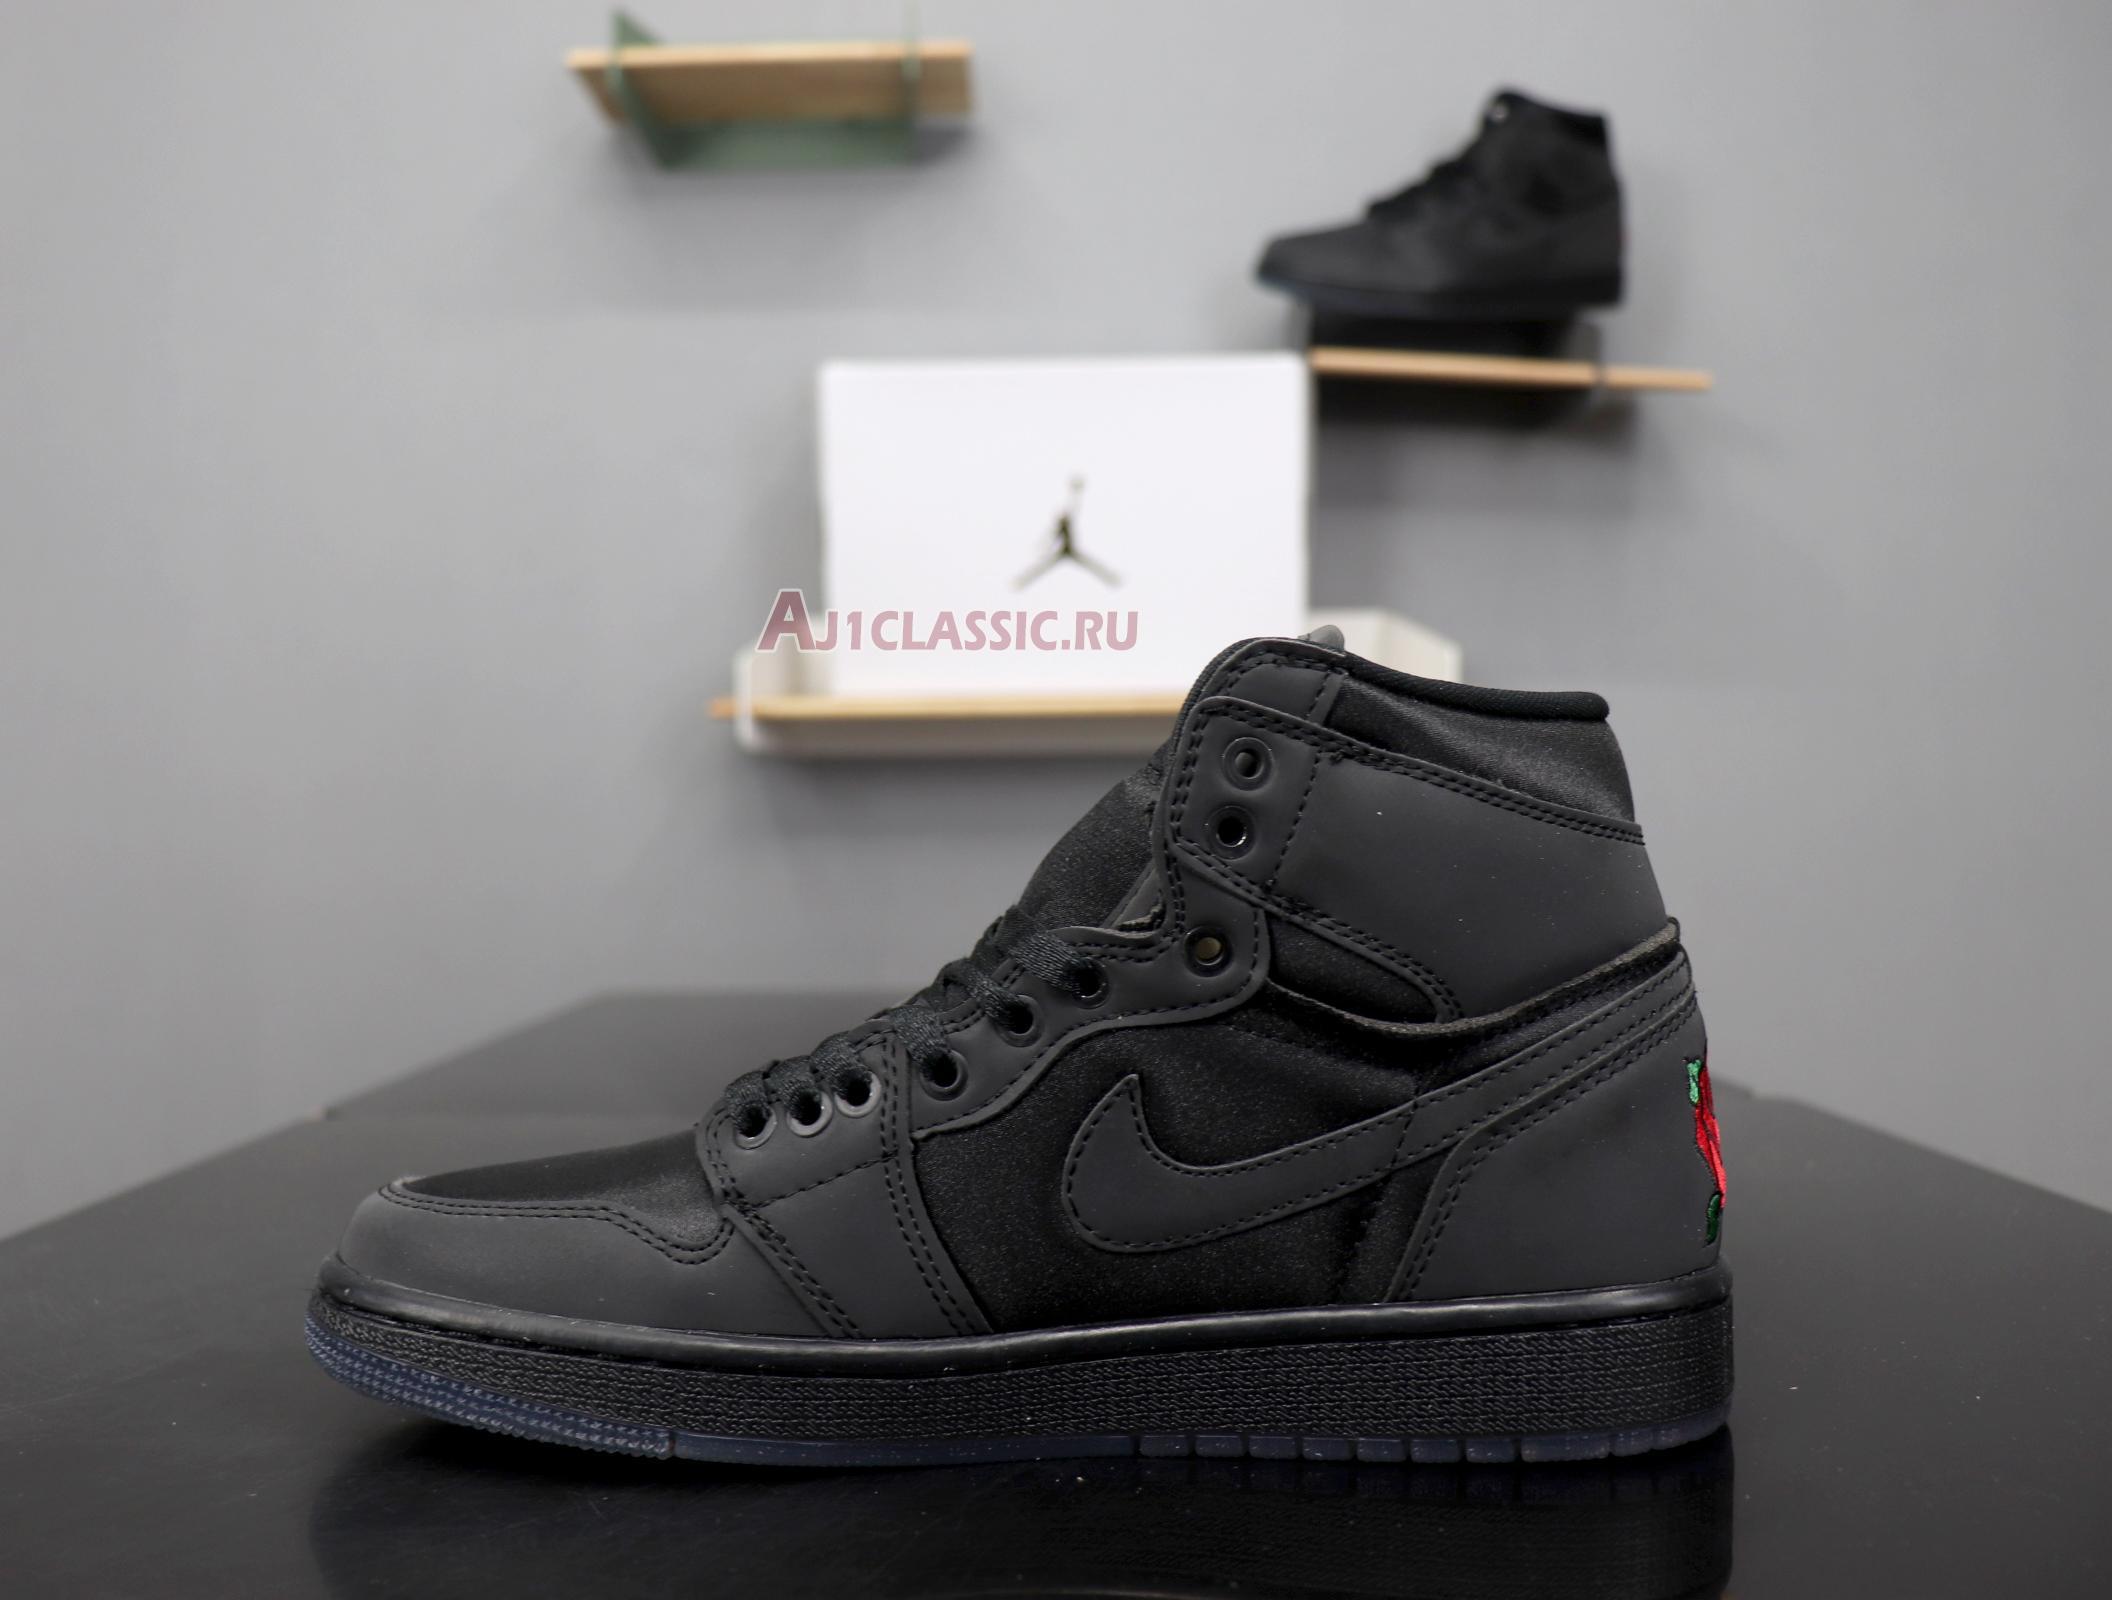 "Rox Brown x Air Jordan 1 Retro High OG ""Black"" BV1576-001"